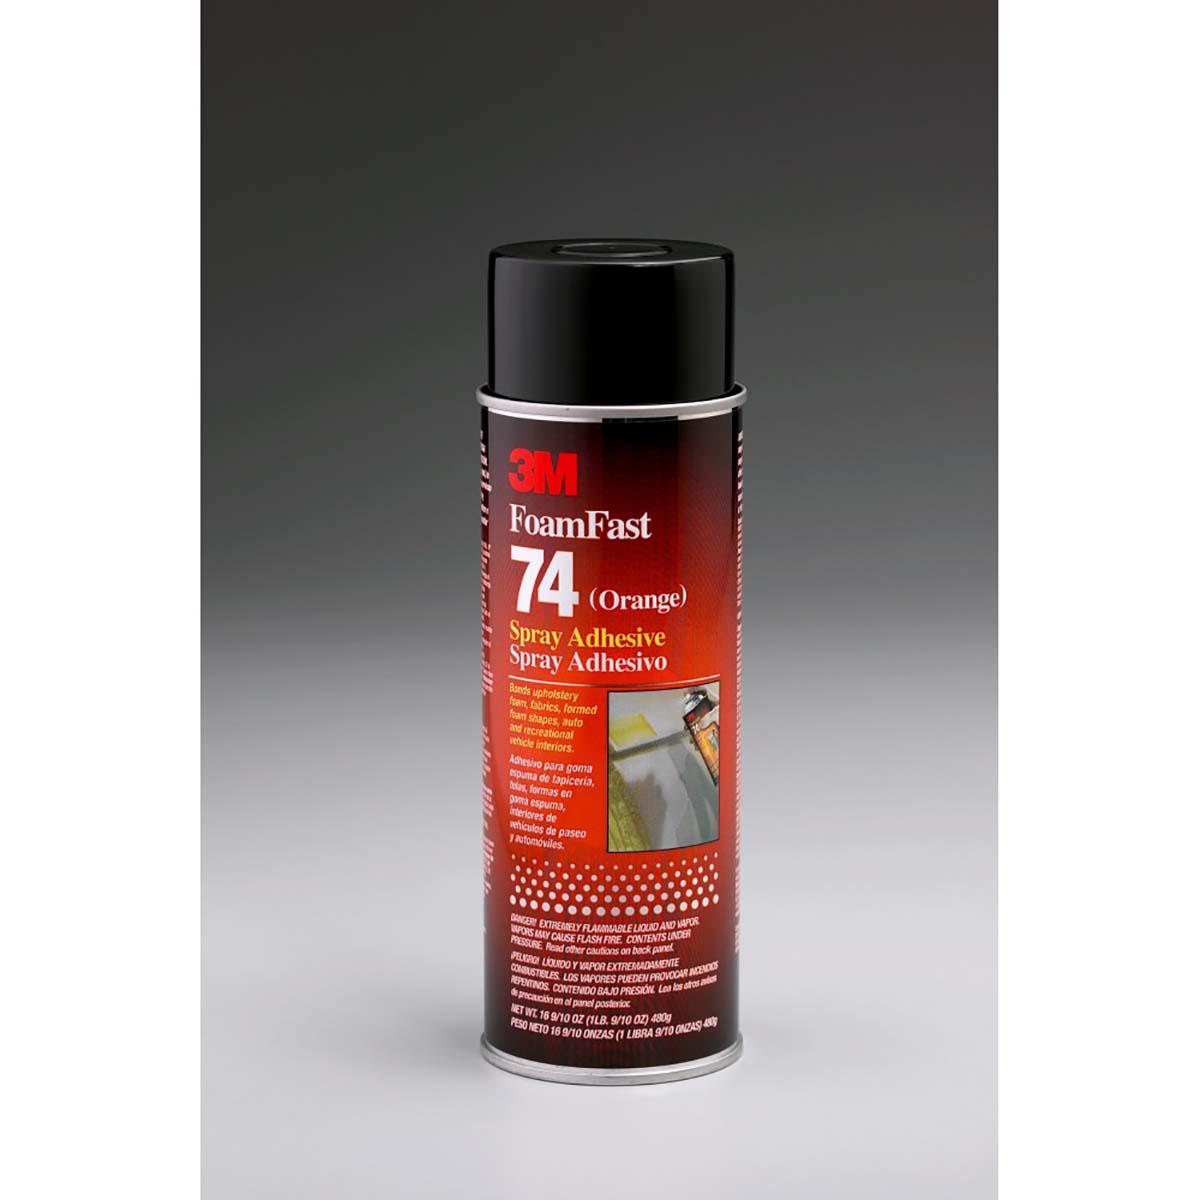 3M Foam Fast 74 Spray Adhesive Orange, Net Wt 16.9 oz, 12 per case